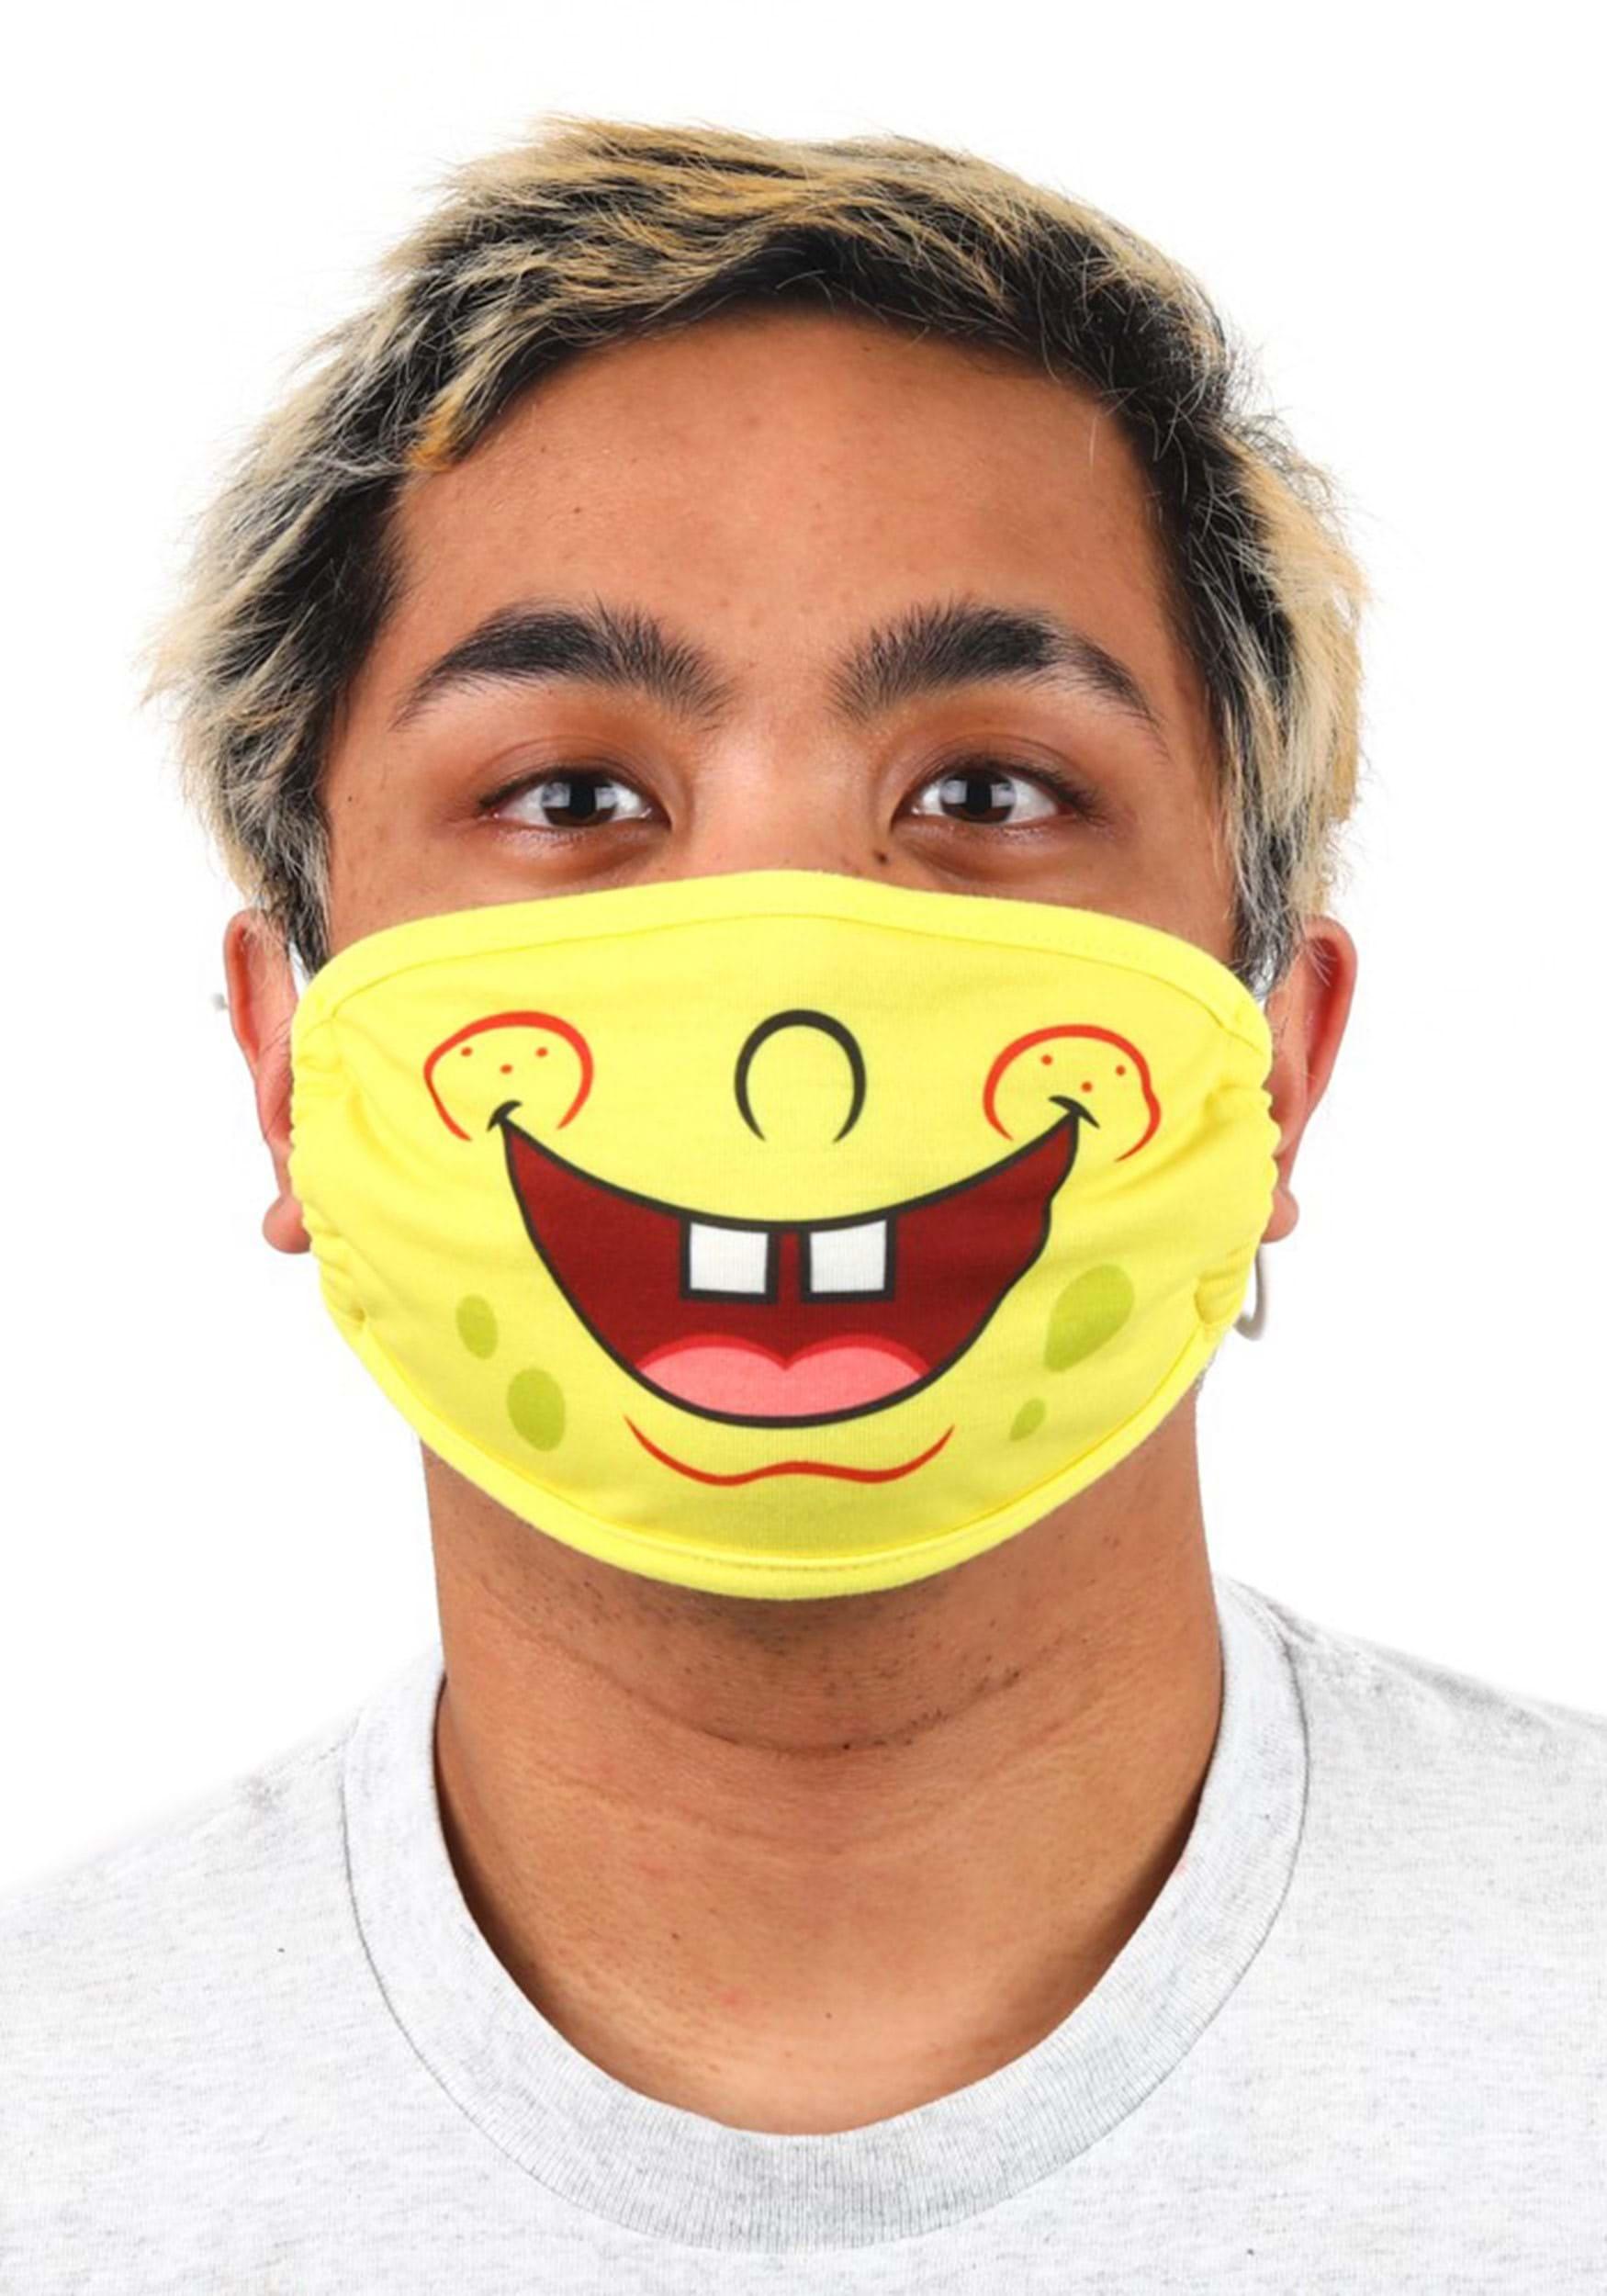 Spongebob Squarepants | Face Mask